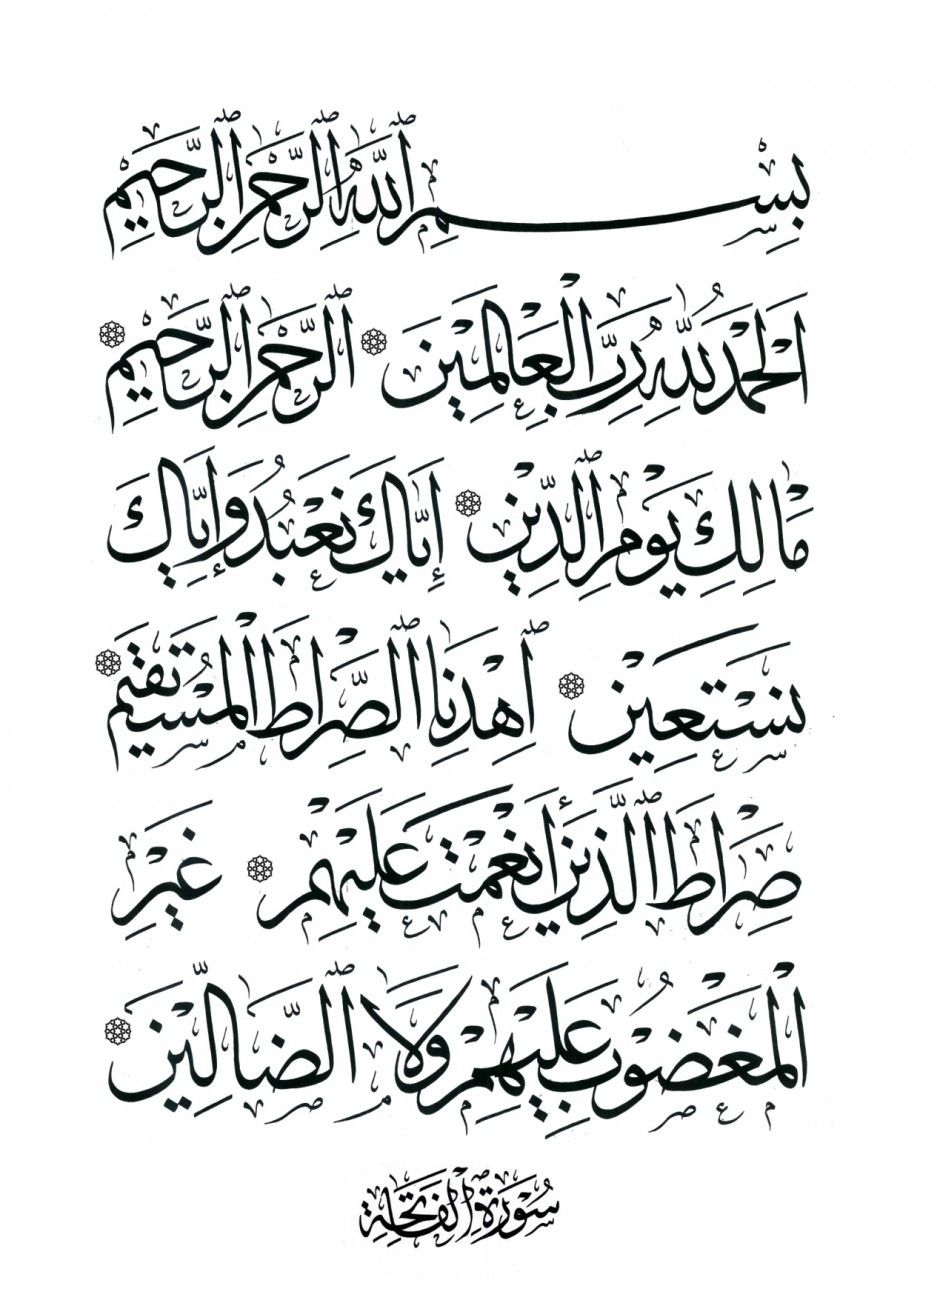 Hasan Kan'an 6 Kaligrafi islam